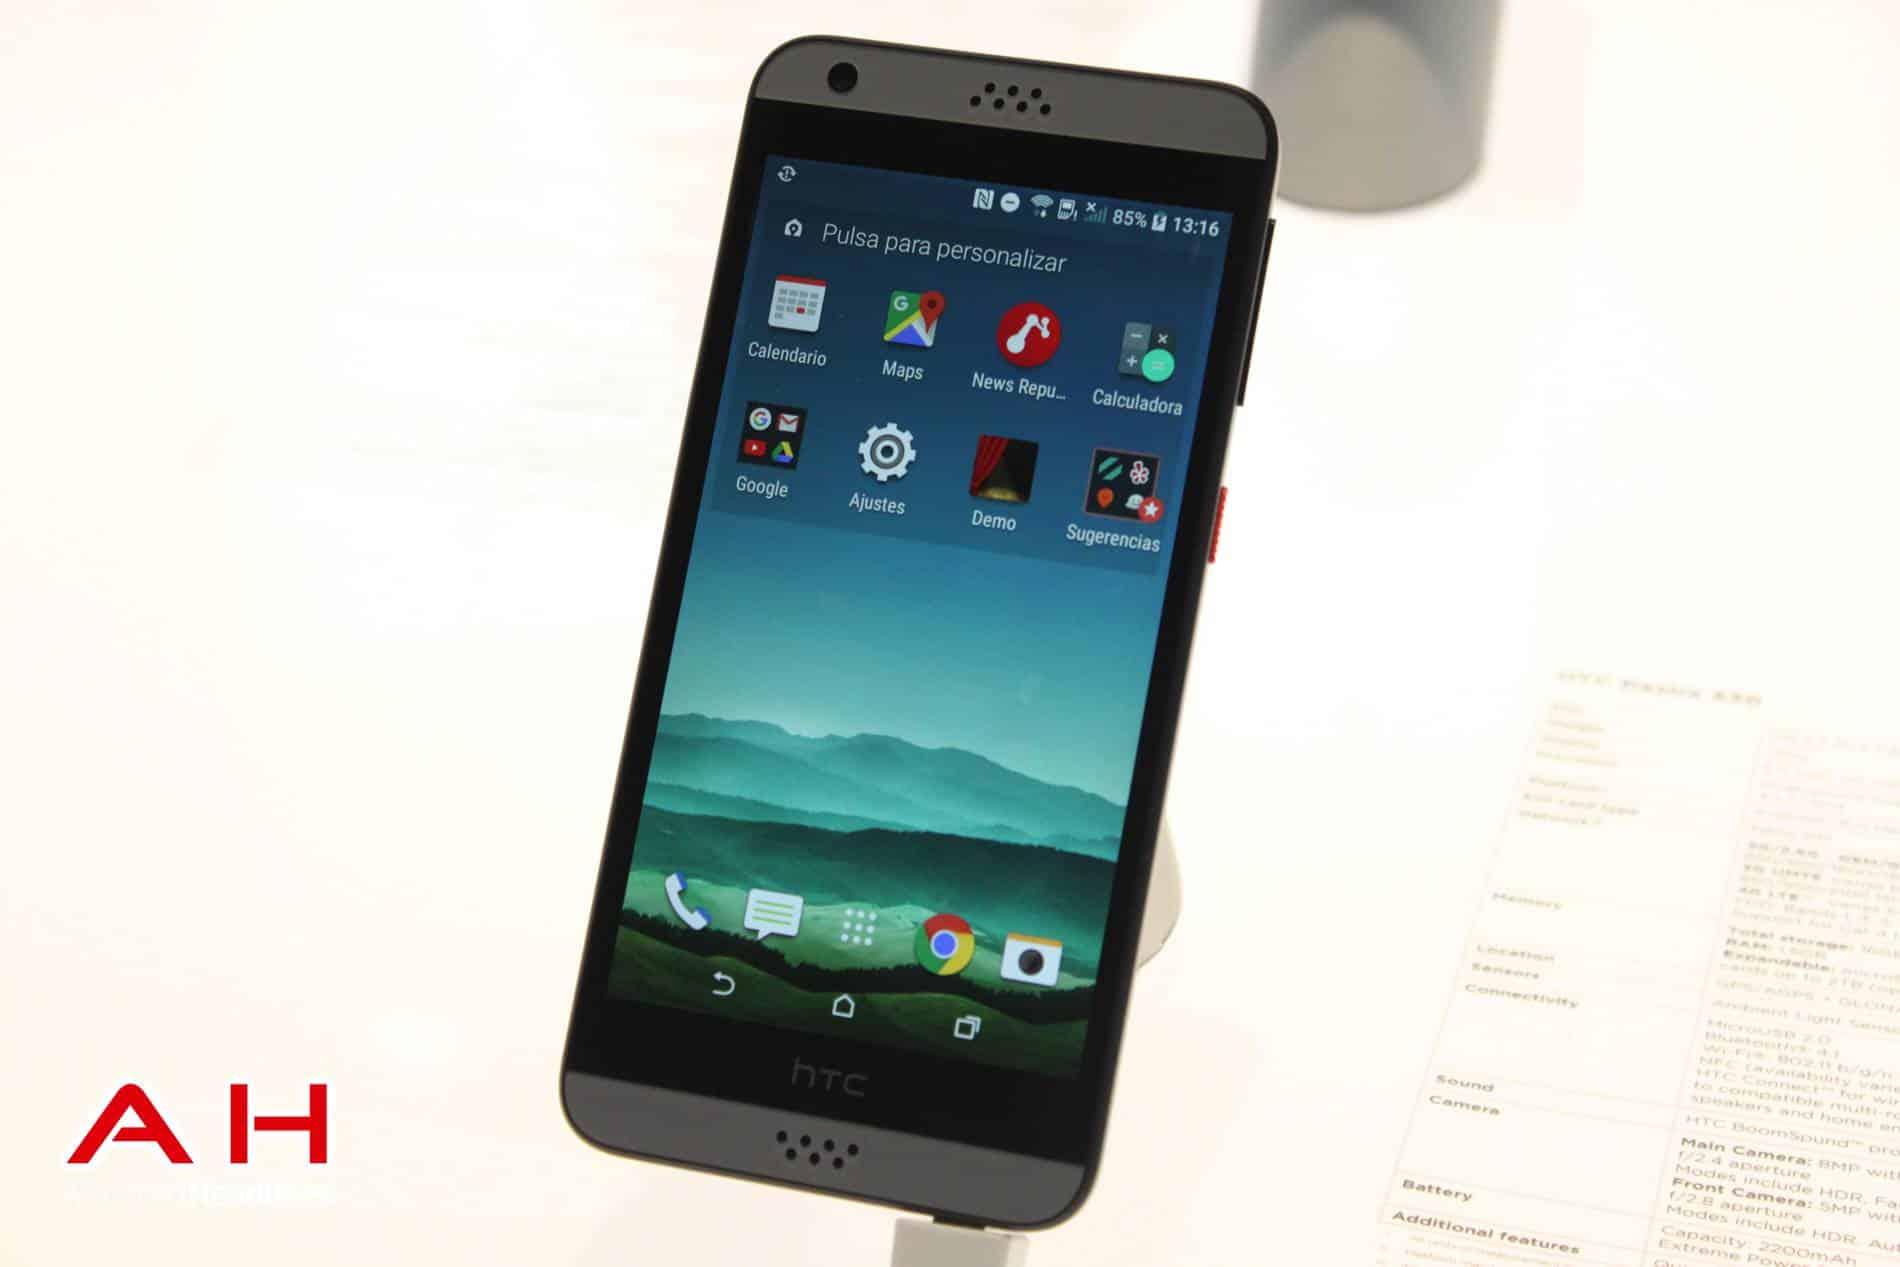 HTC Desire 530 MWC AH 01